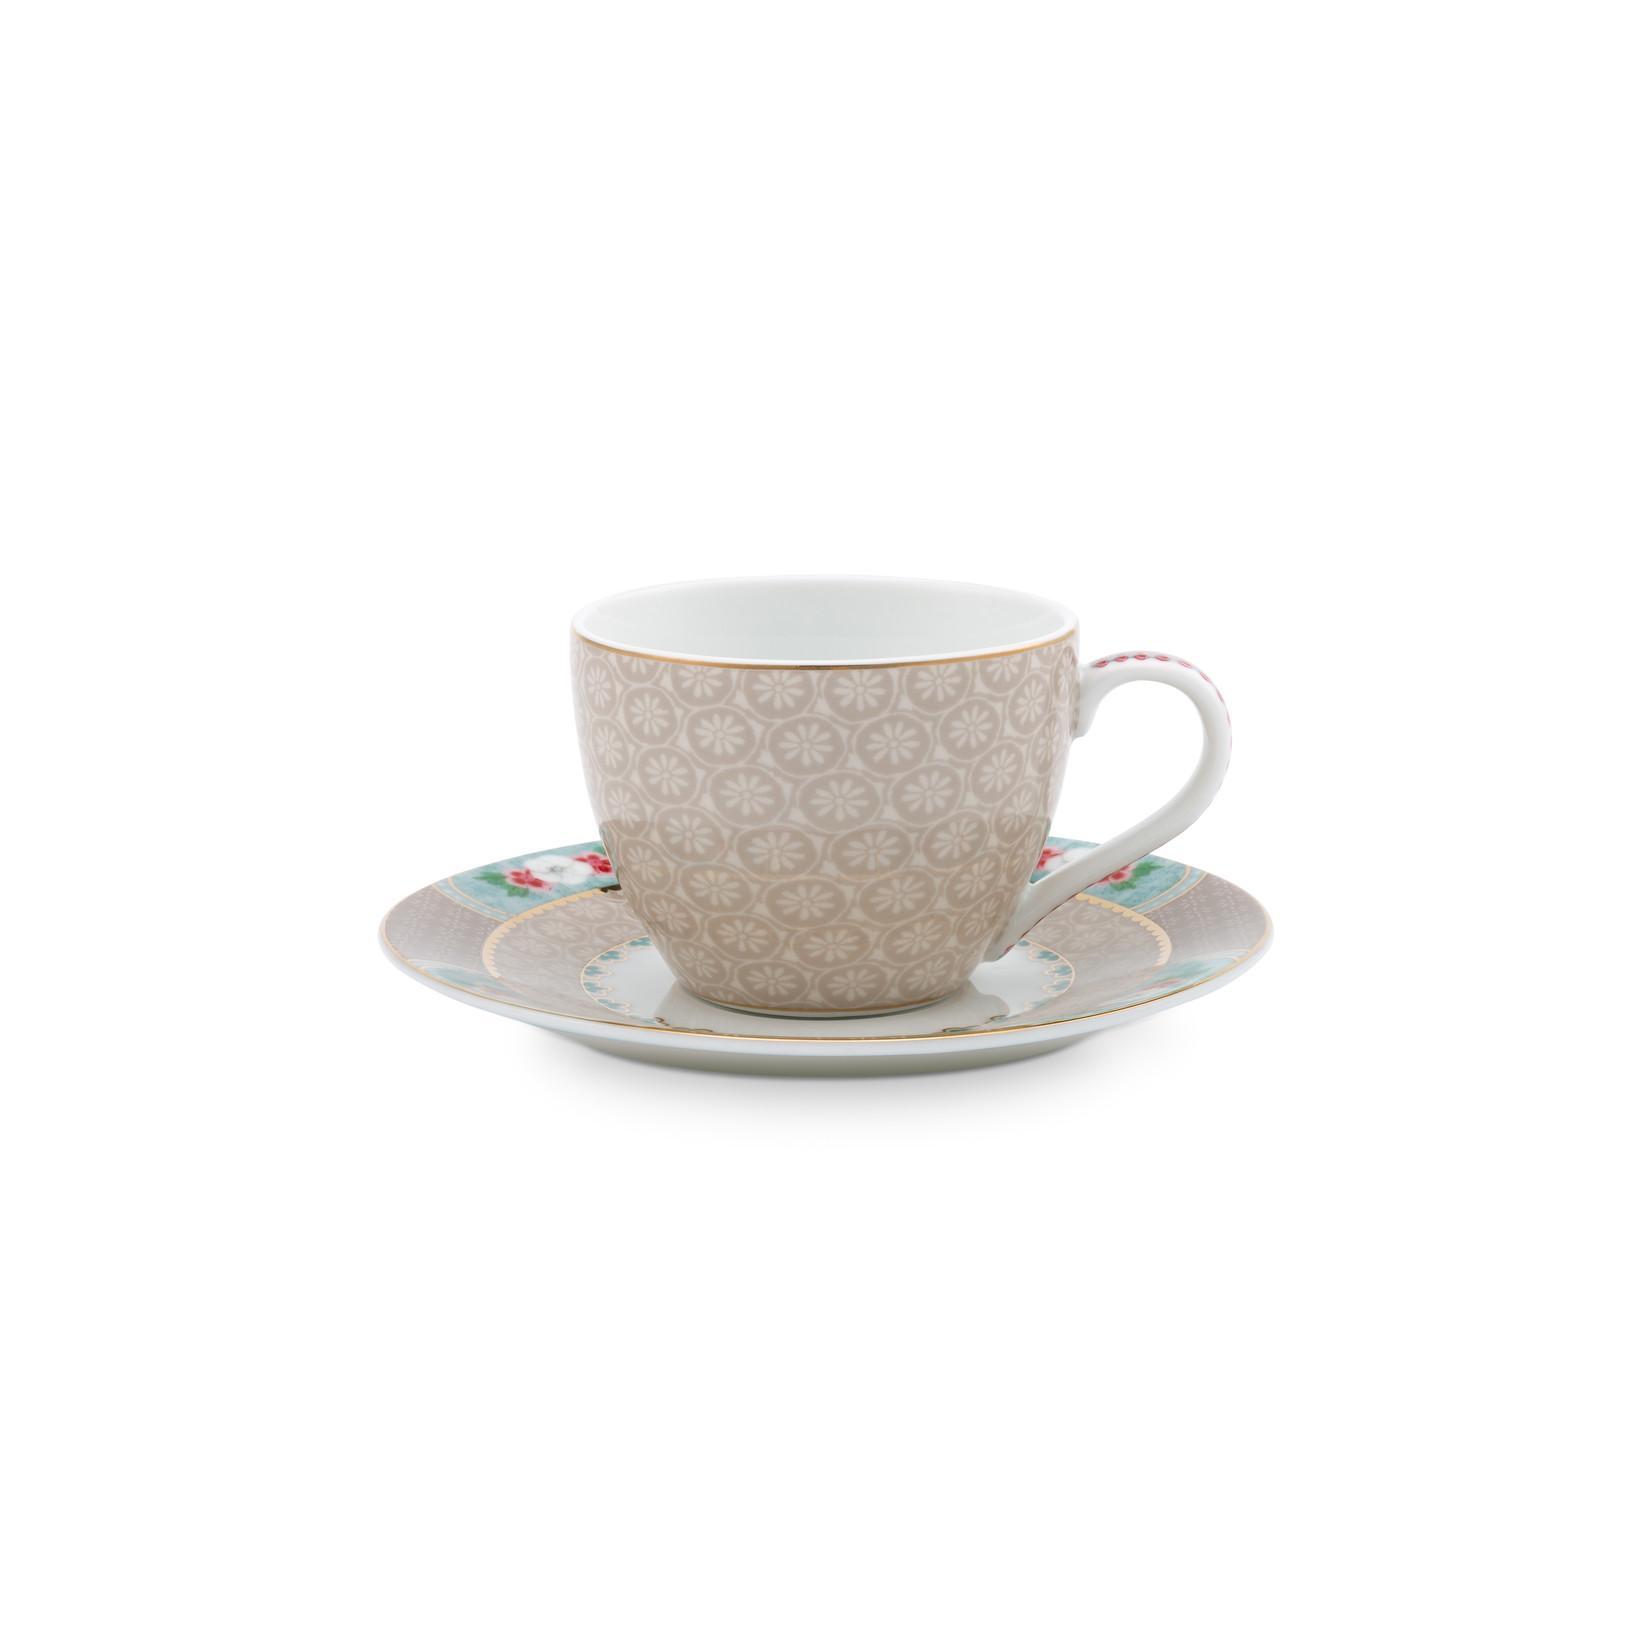 PIP Studio Espresso Cup & Saucer Blushing Birds Khaki 120ml